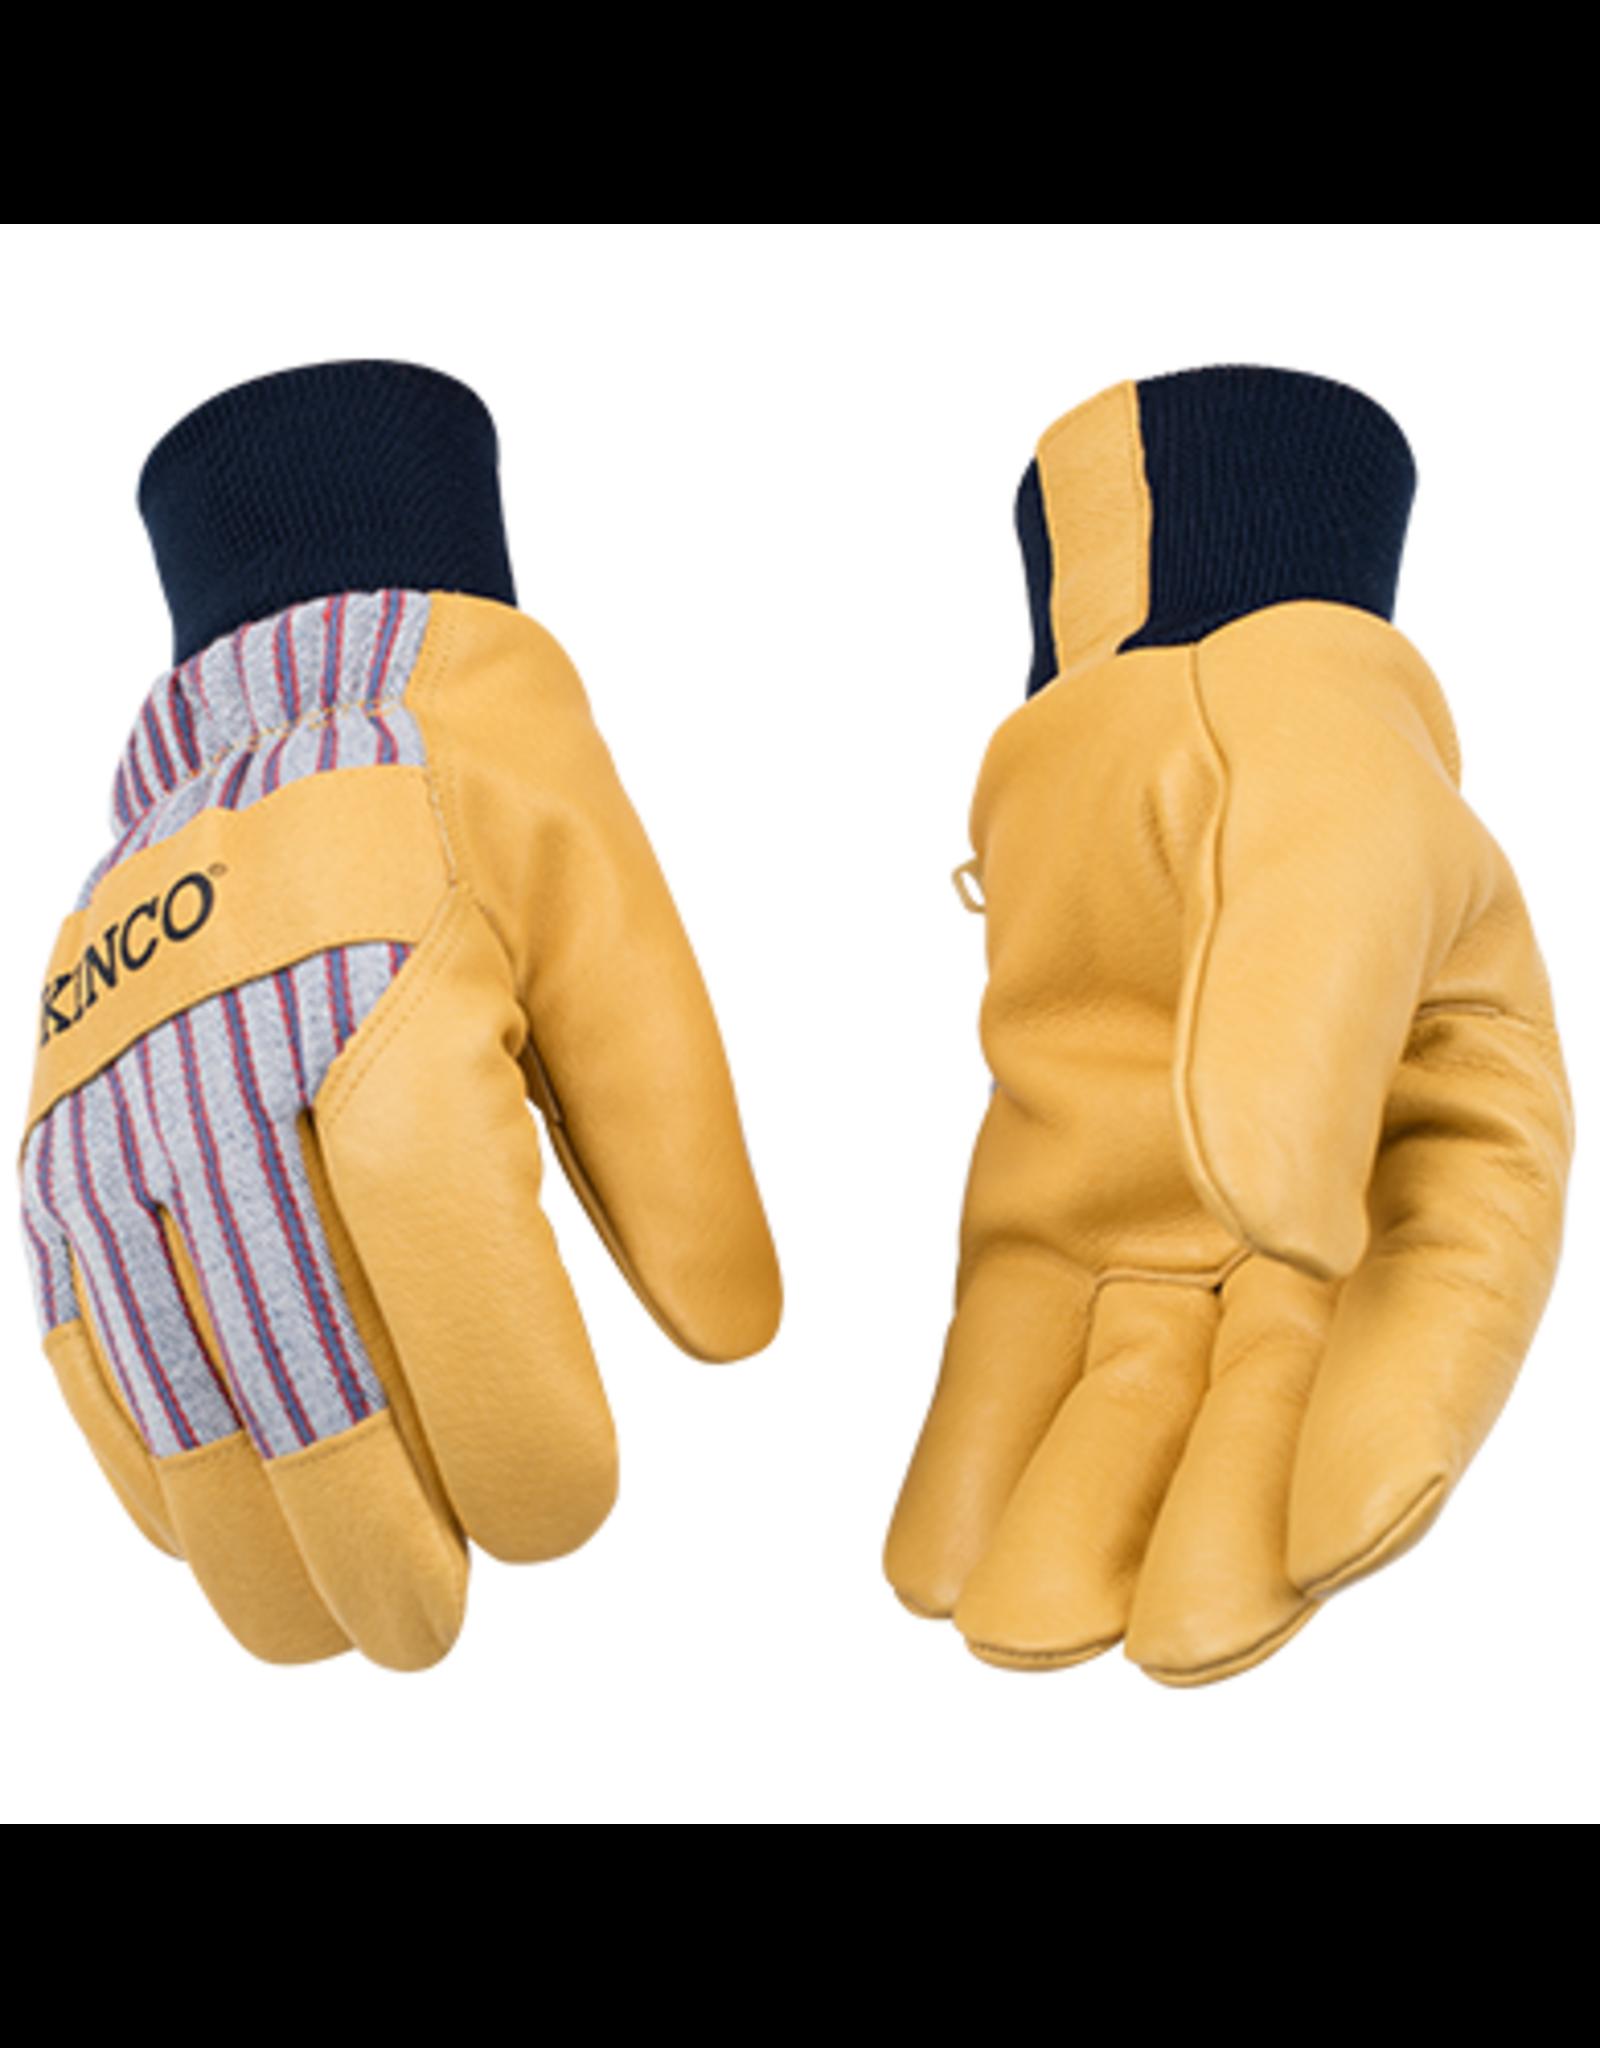 Kinco 1927KW™ Lined Premium Grain Pigskin Palm With Knit Wrist